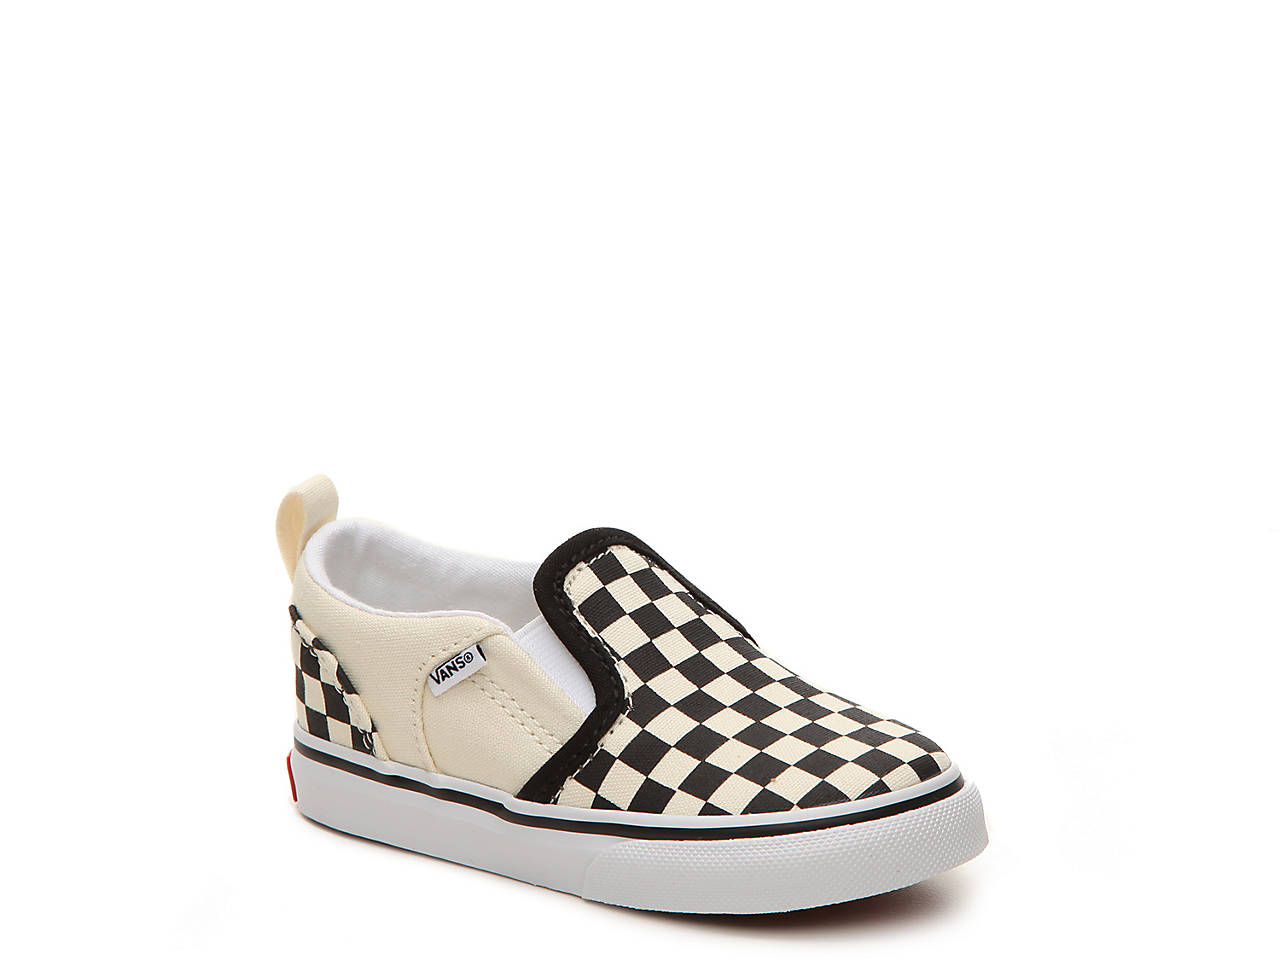 6679bc81652de6 Vans Asher Checkers Infant   Toddler Slip-On Sneaker Kids Shoes